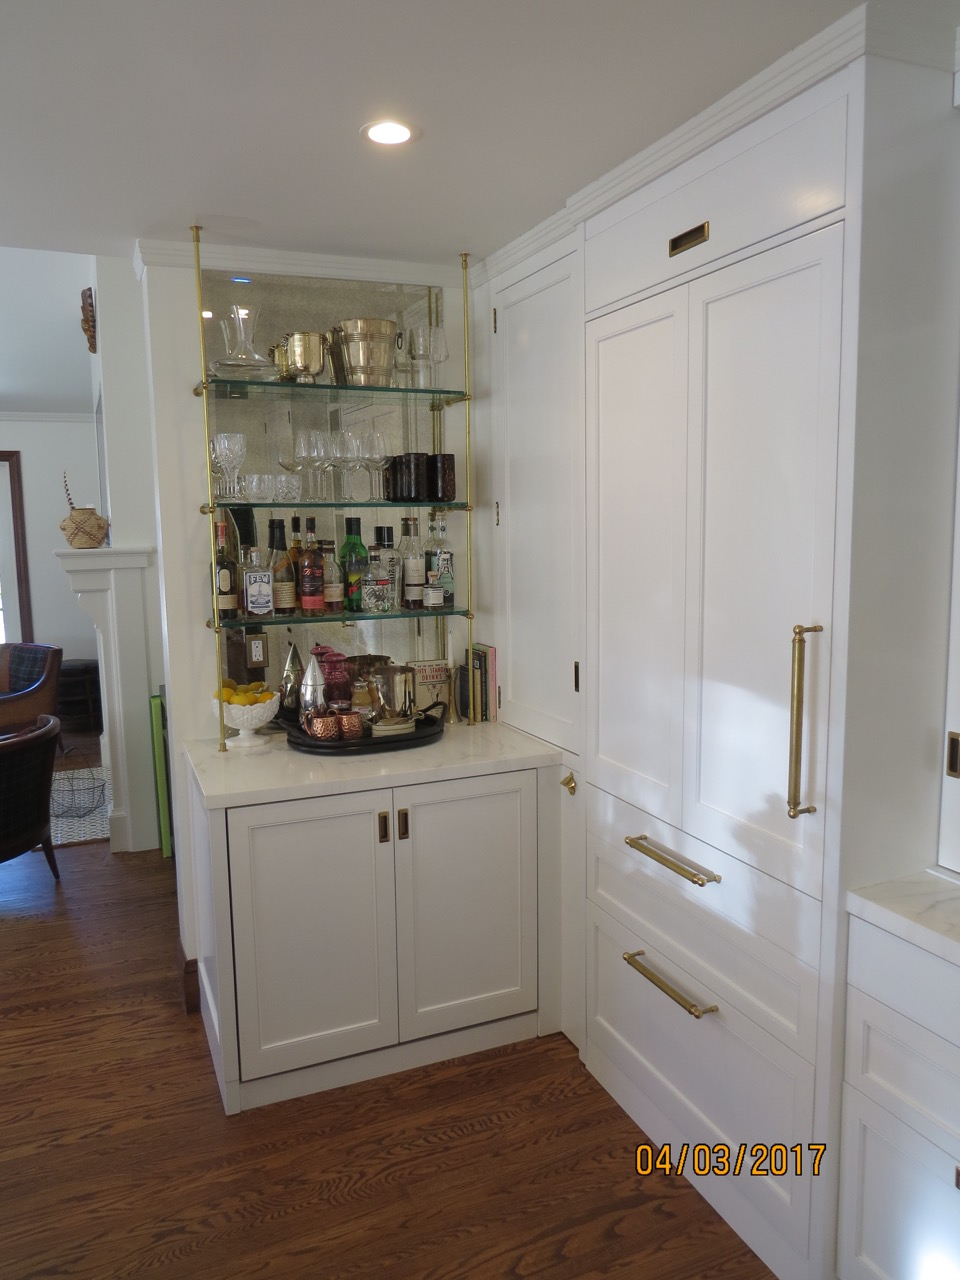 Integral U-line refrigerator and under-counter fridge.